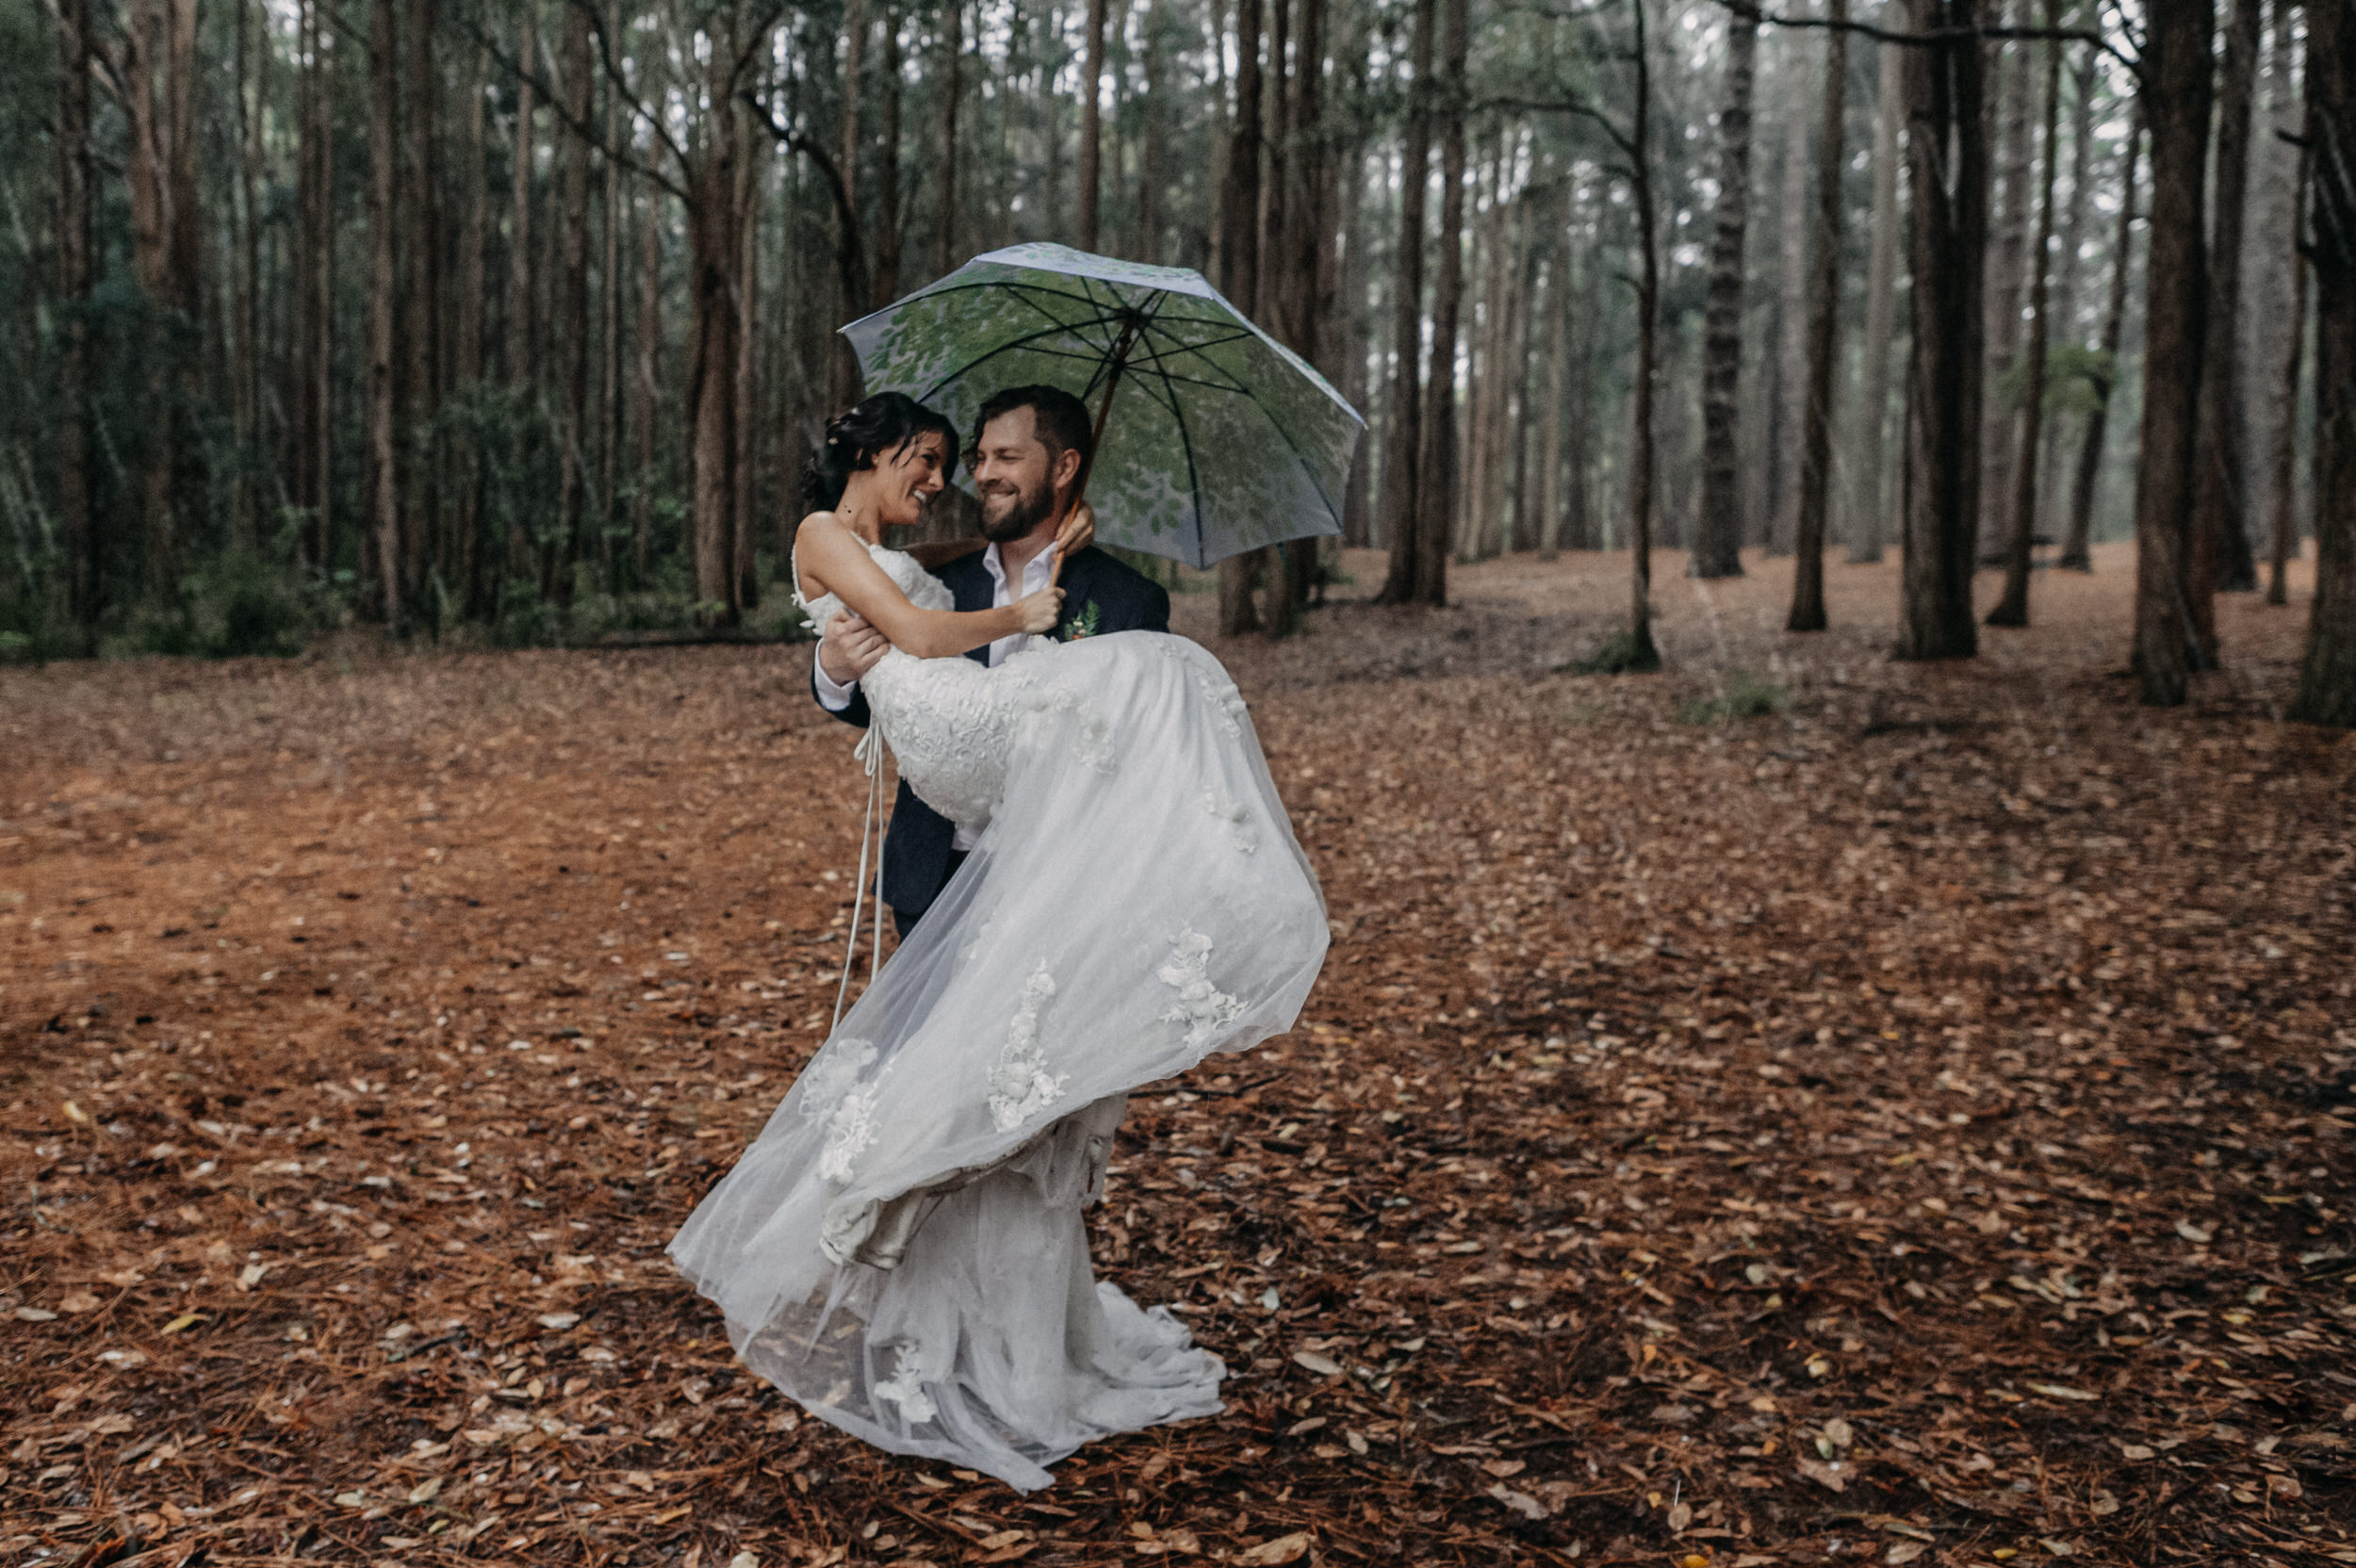 CAnberra_Wedding_Photographer_Rainy_Wedding_Lauren_Campbell